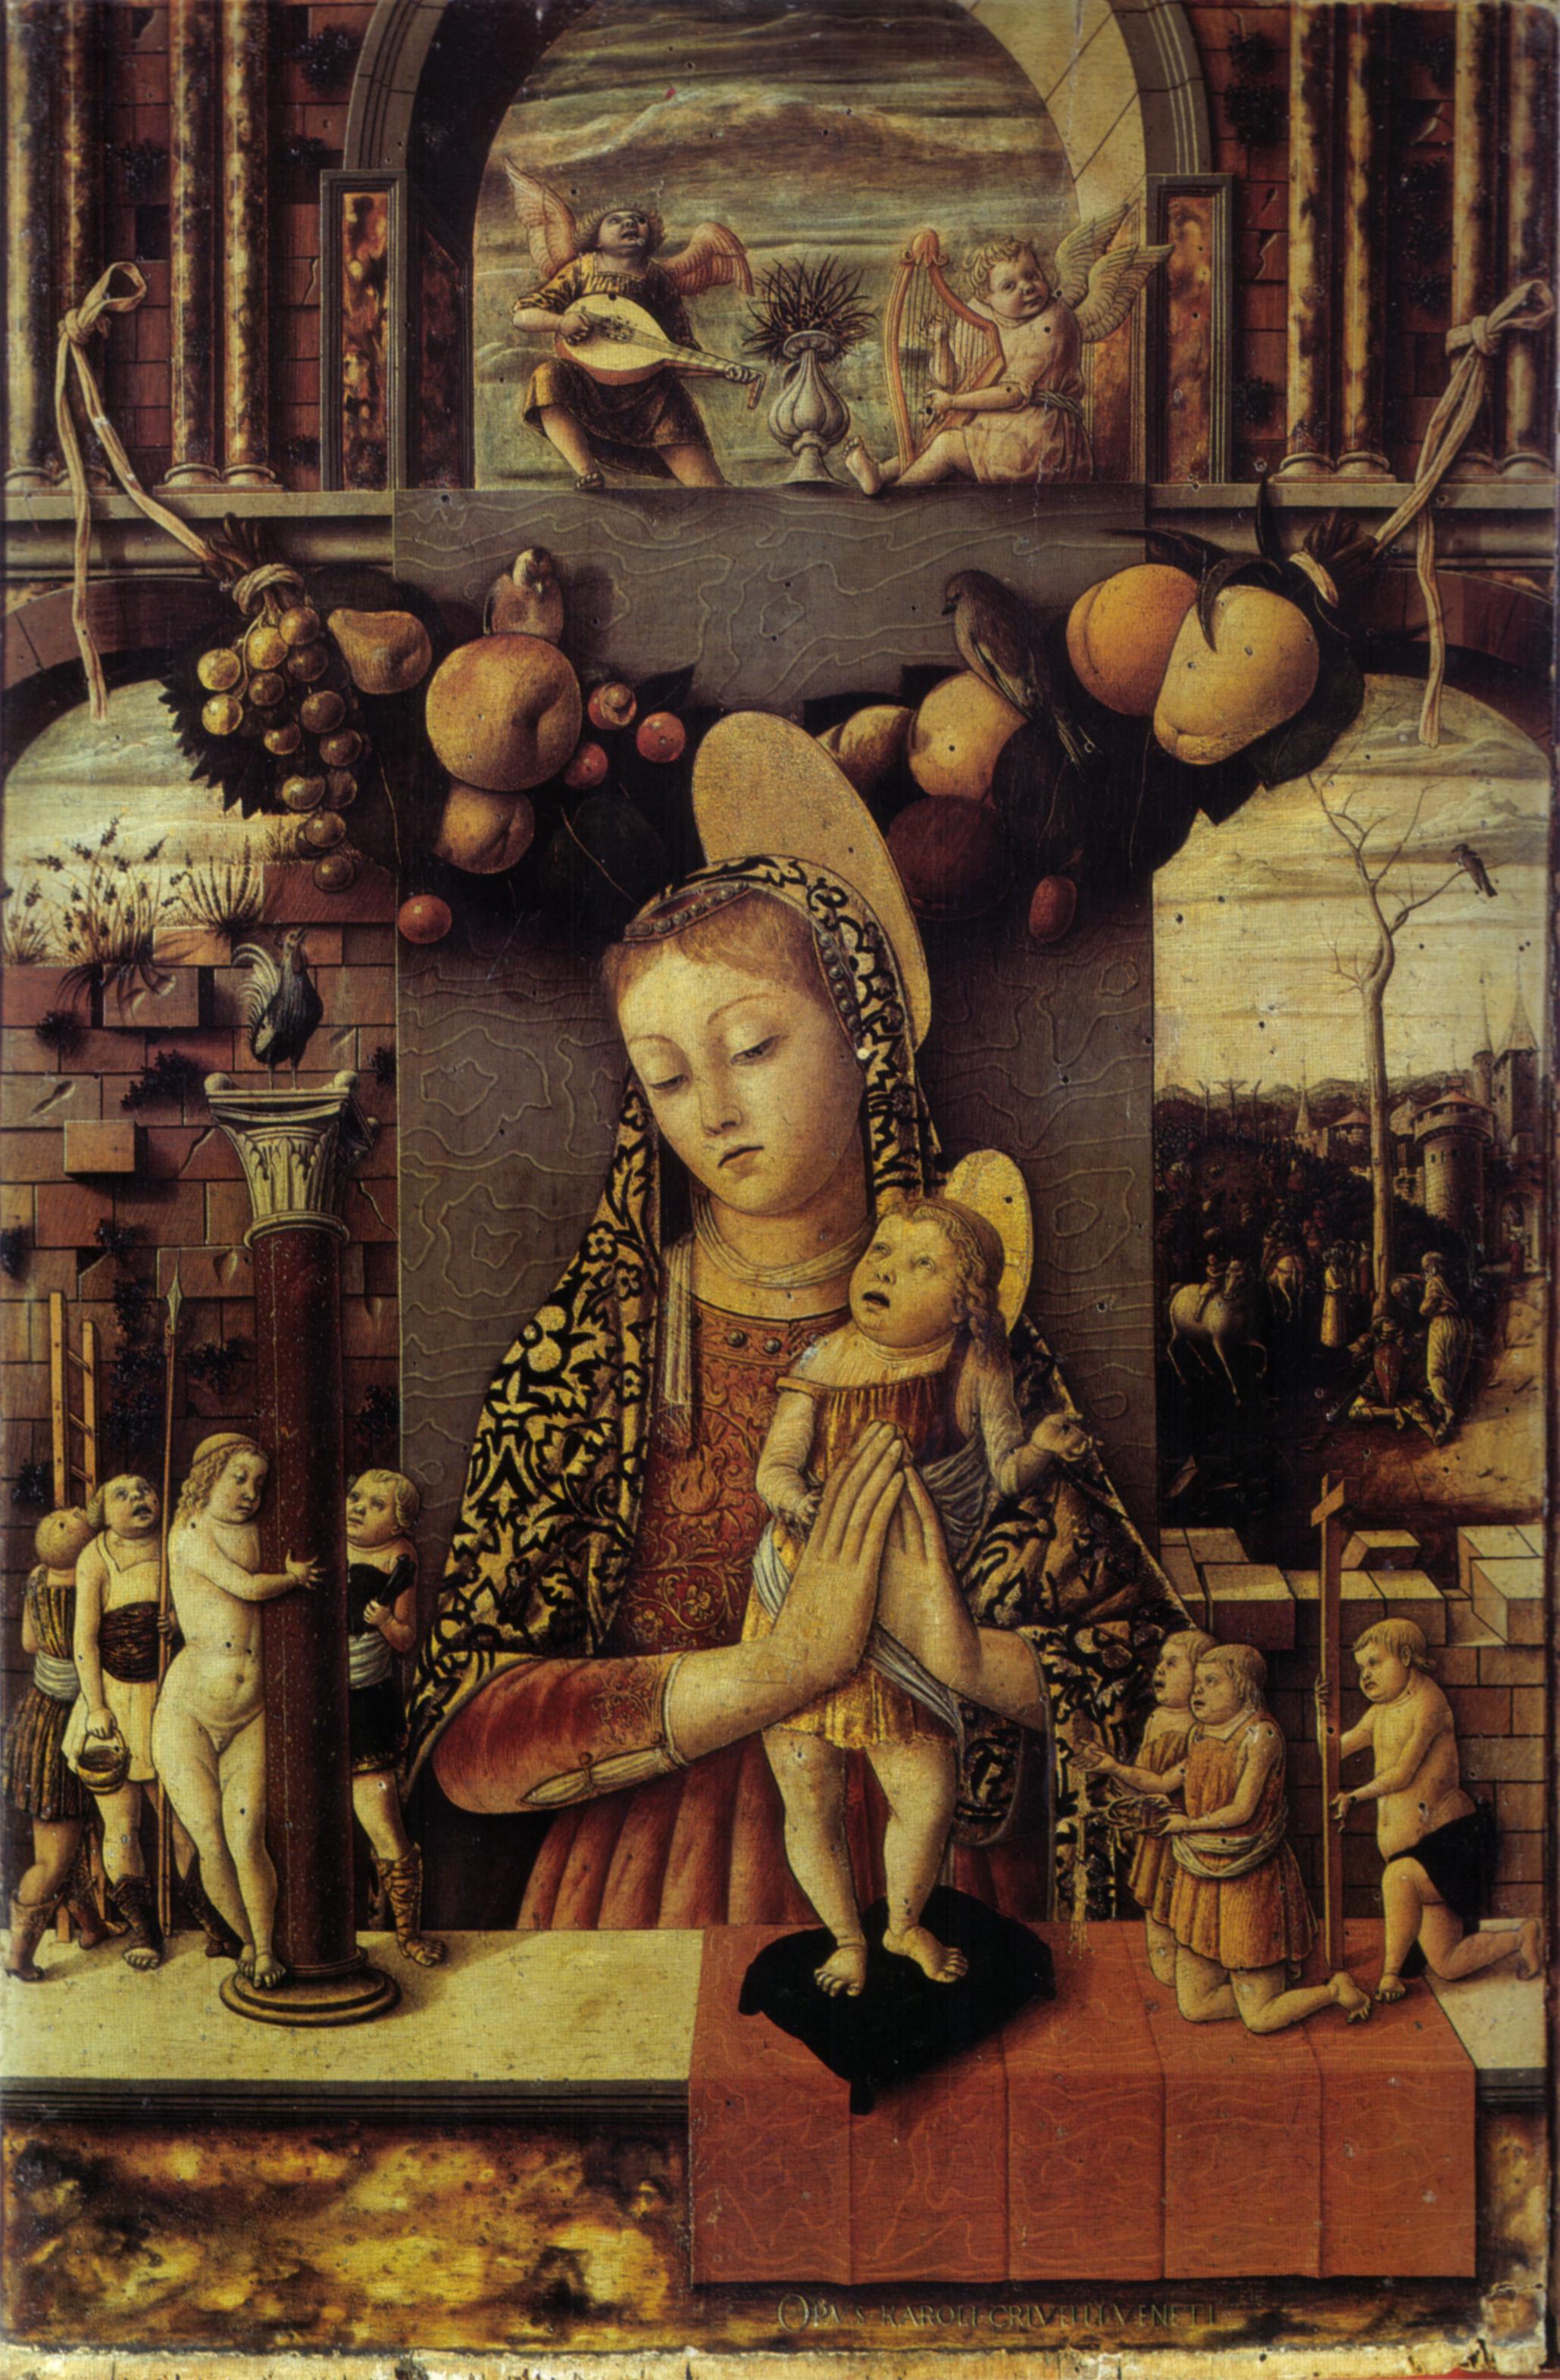 The Madonna of the Passion (Carlo Crivelli, 1460, tempera on panel)